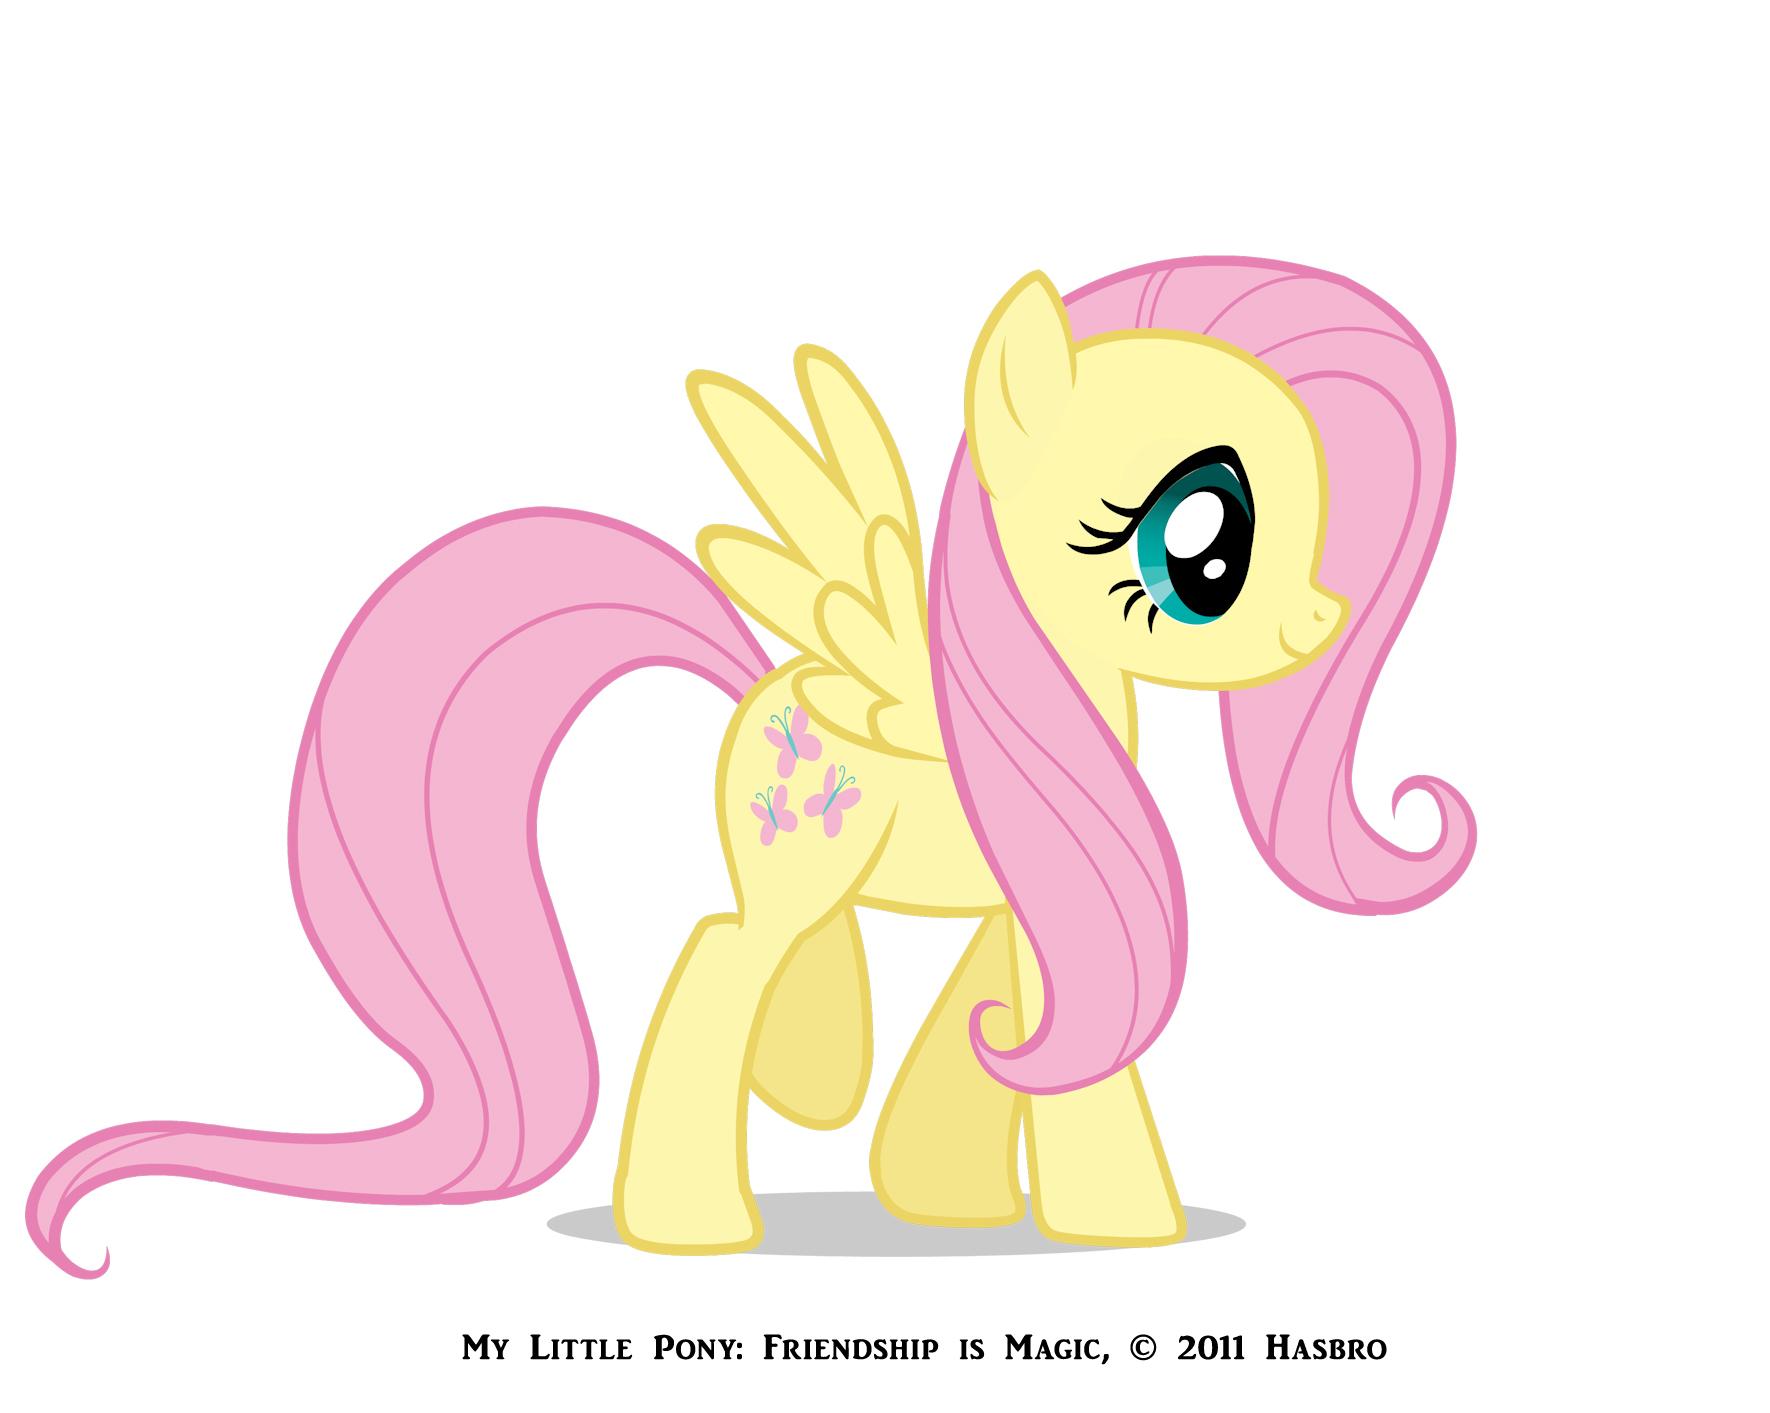 تقرير كامل عن ماي ليتل بوني My little pony fluttershyreference.